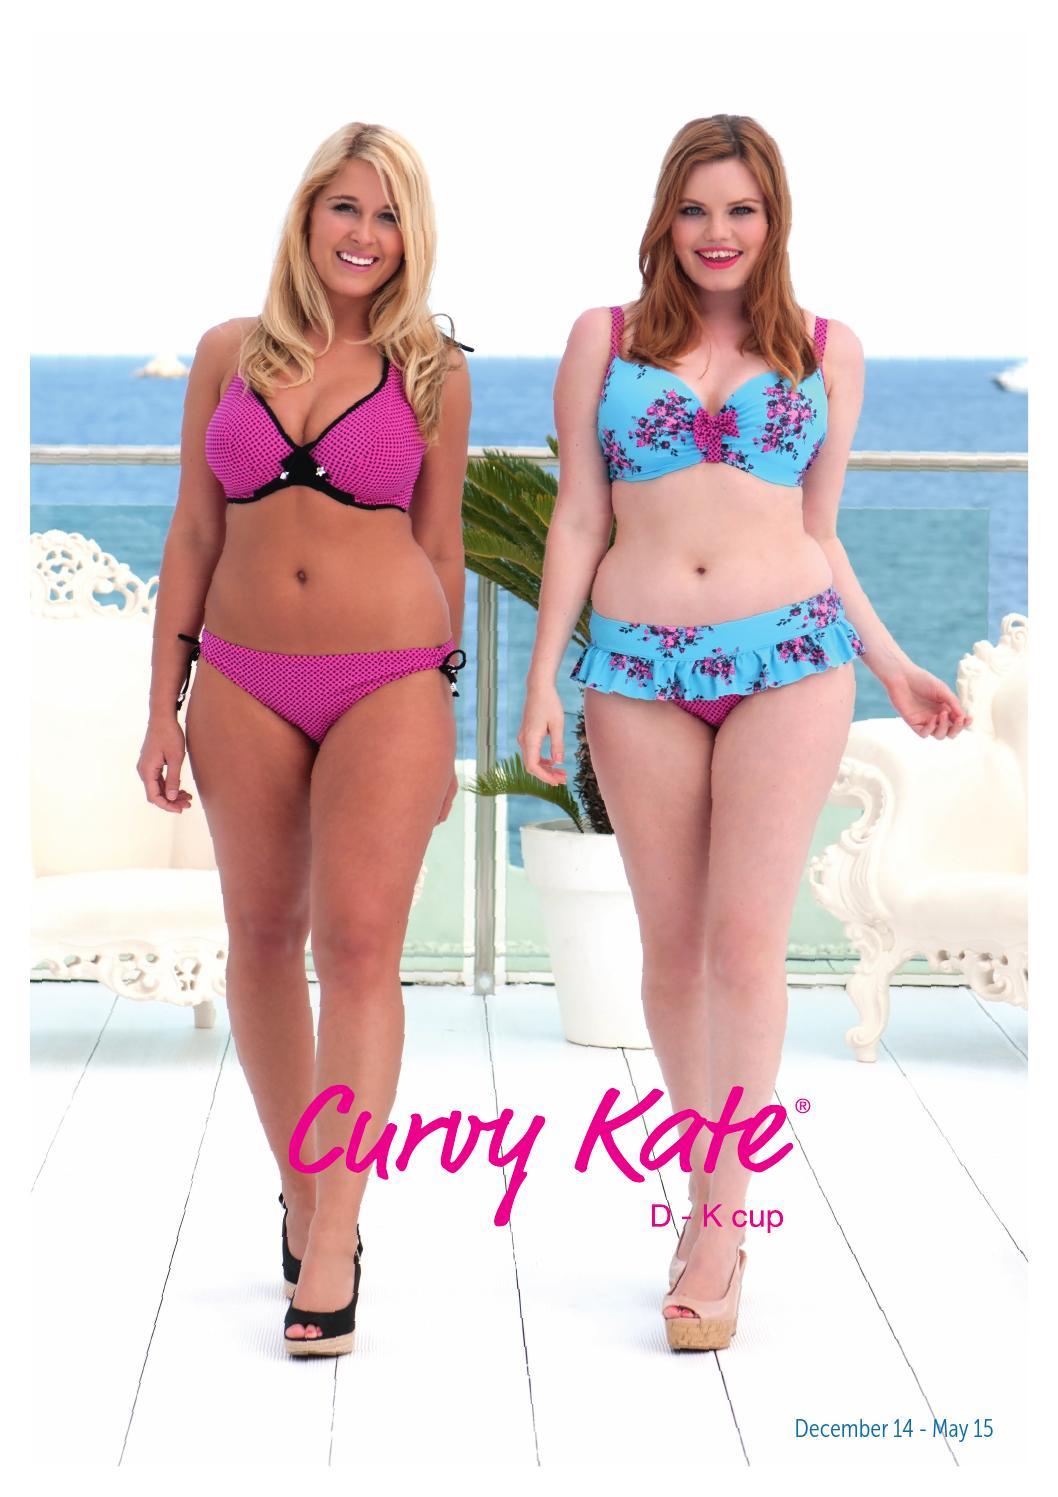 Curvy Kate Ocean Drive Bikini Short Brief Electric Blue Curvy Kate Swimwear UK 8